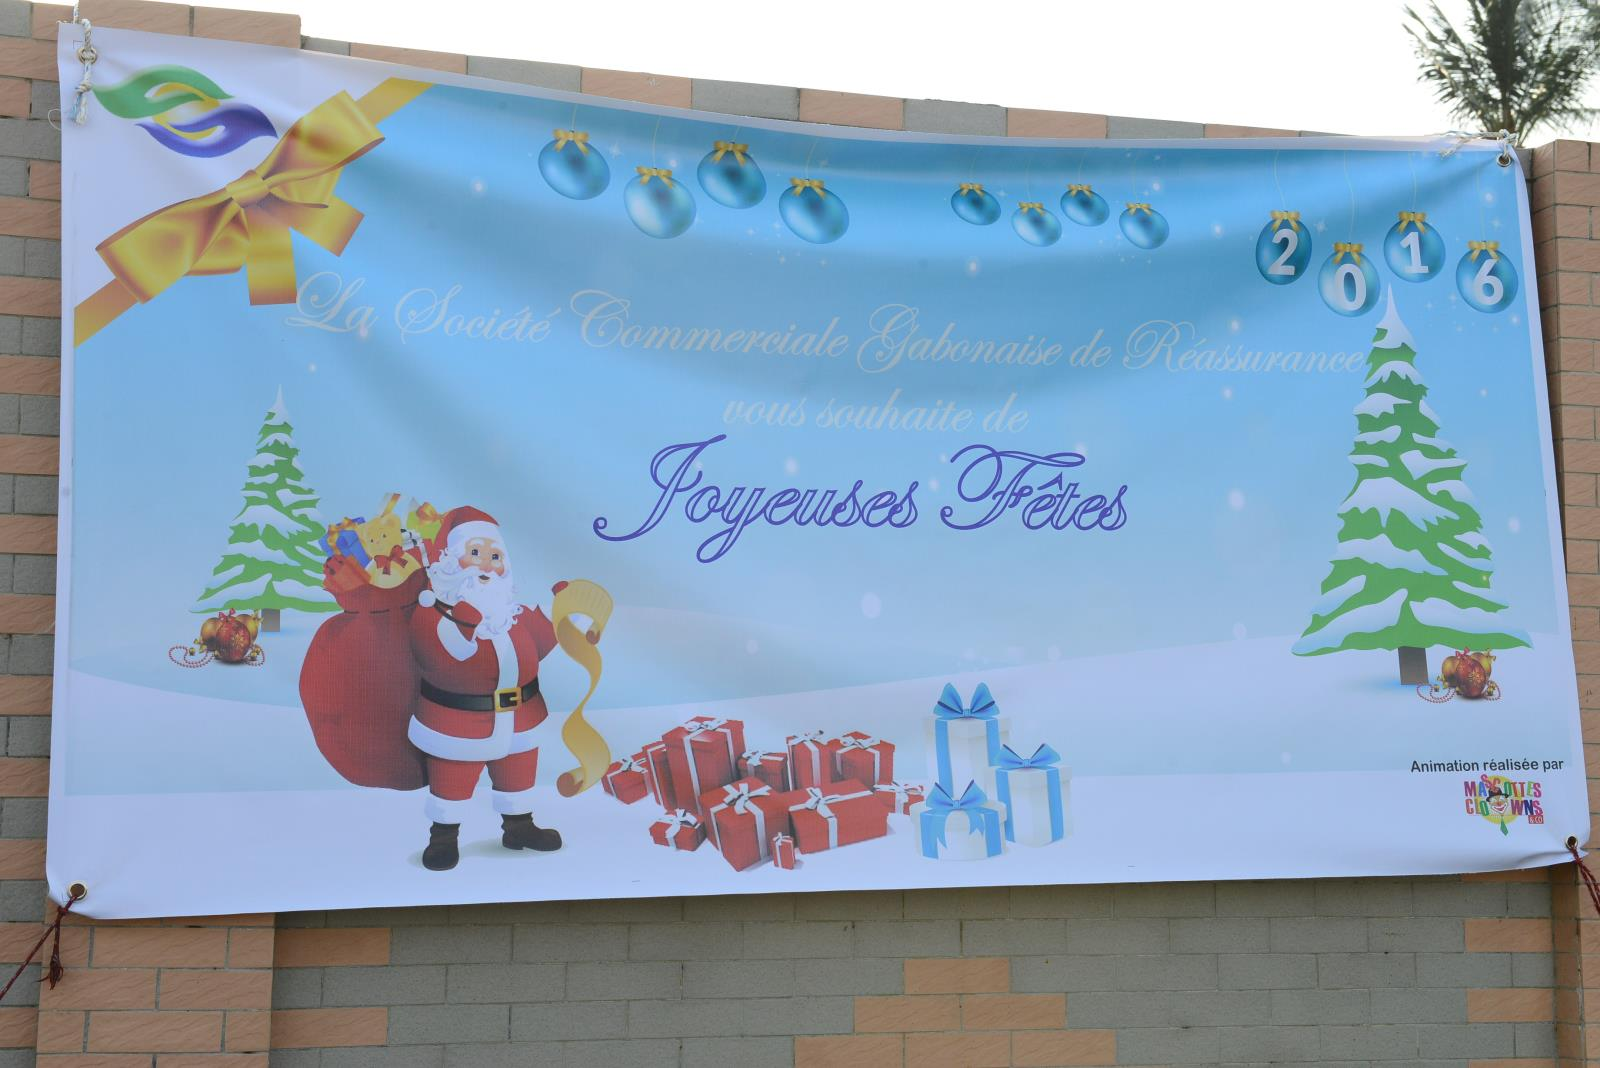 "<span class=""entry-title-primary"">Photos Arbre de Noël de la SCG-Ré</span> <span class=""entry-subtitle"">Arbre de Noël de la SCG-Ré, le mercredi 23 Décembre 2015</span>"